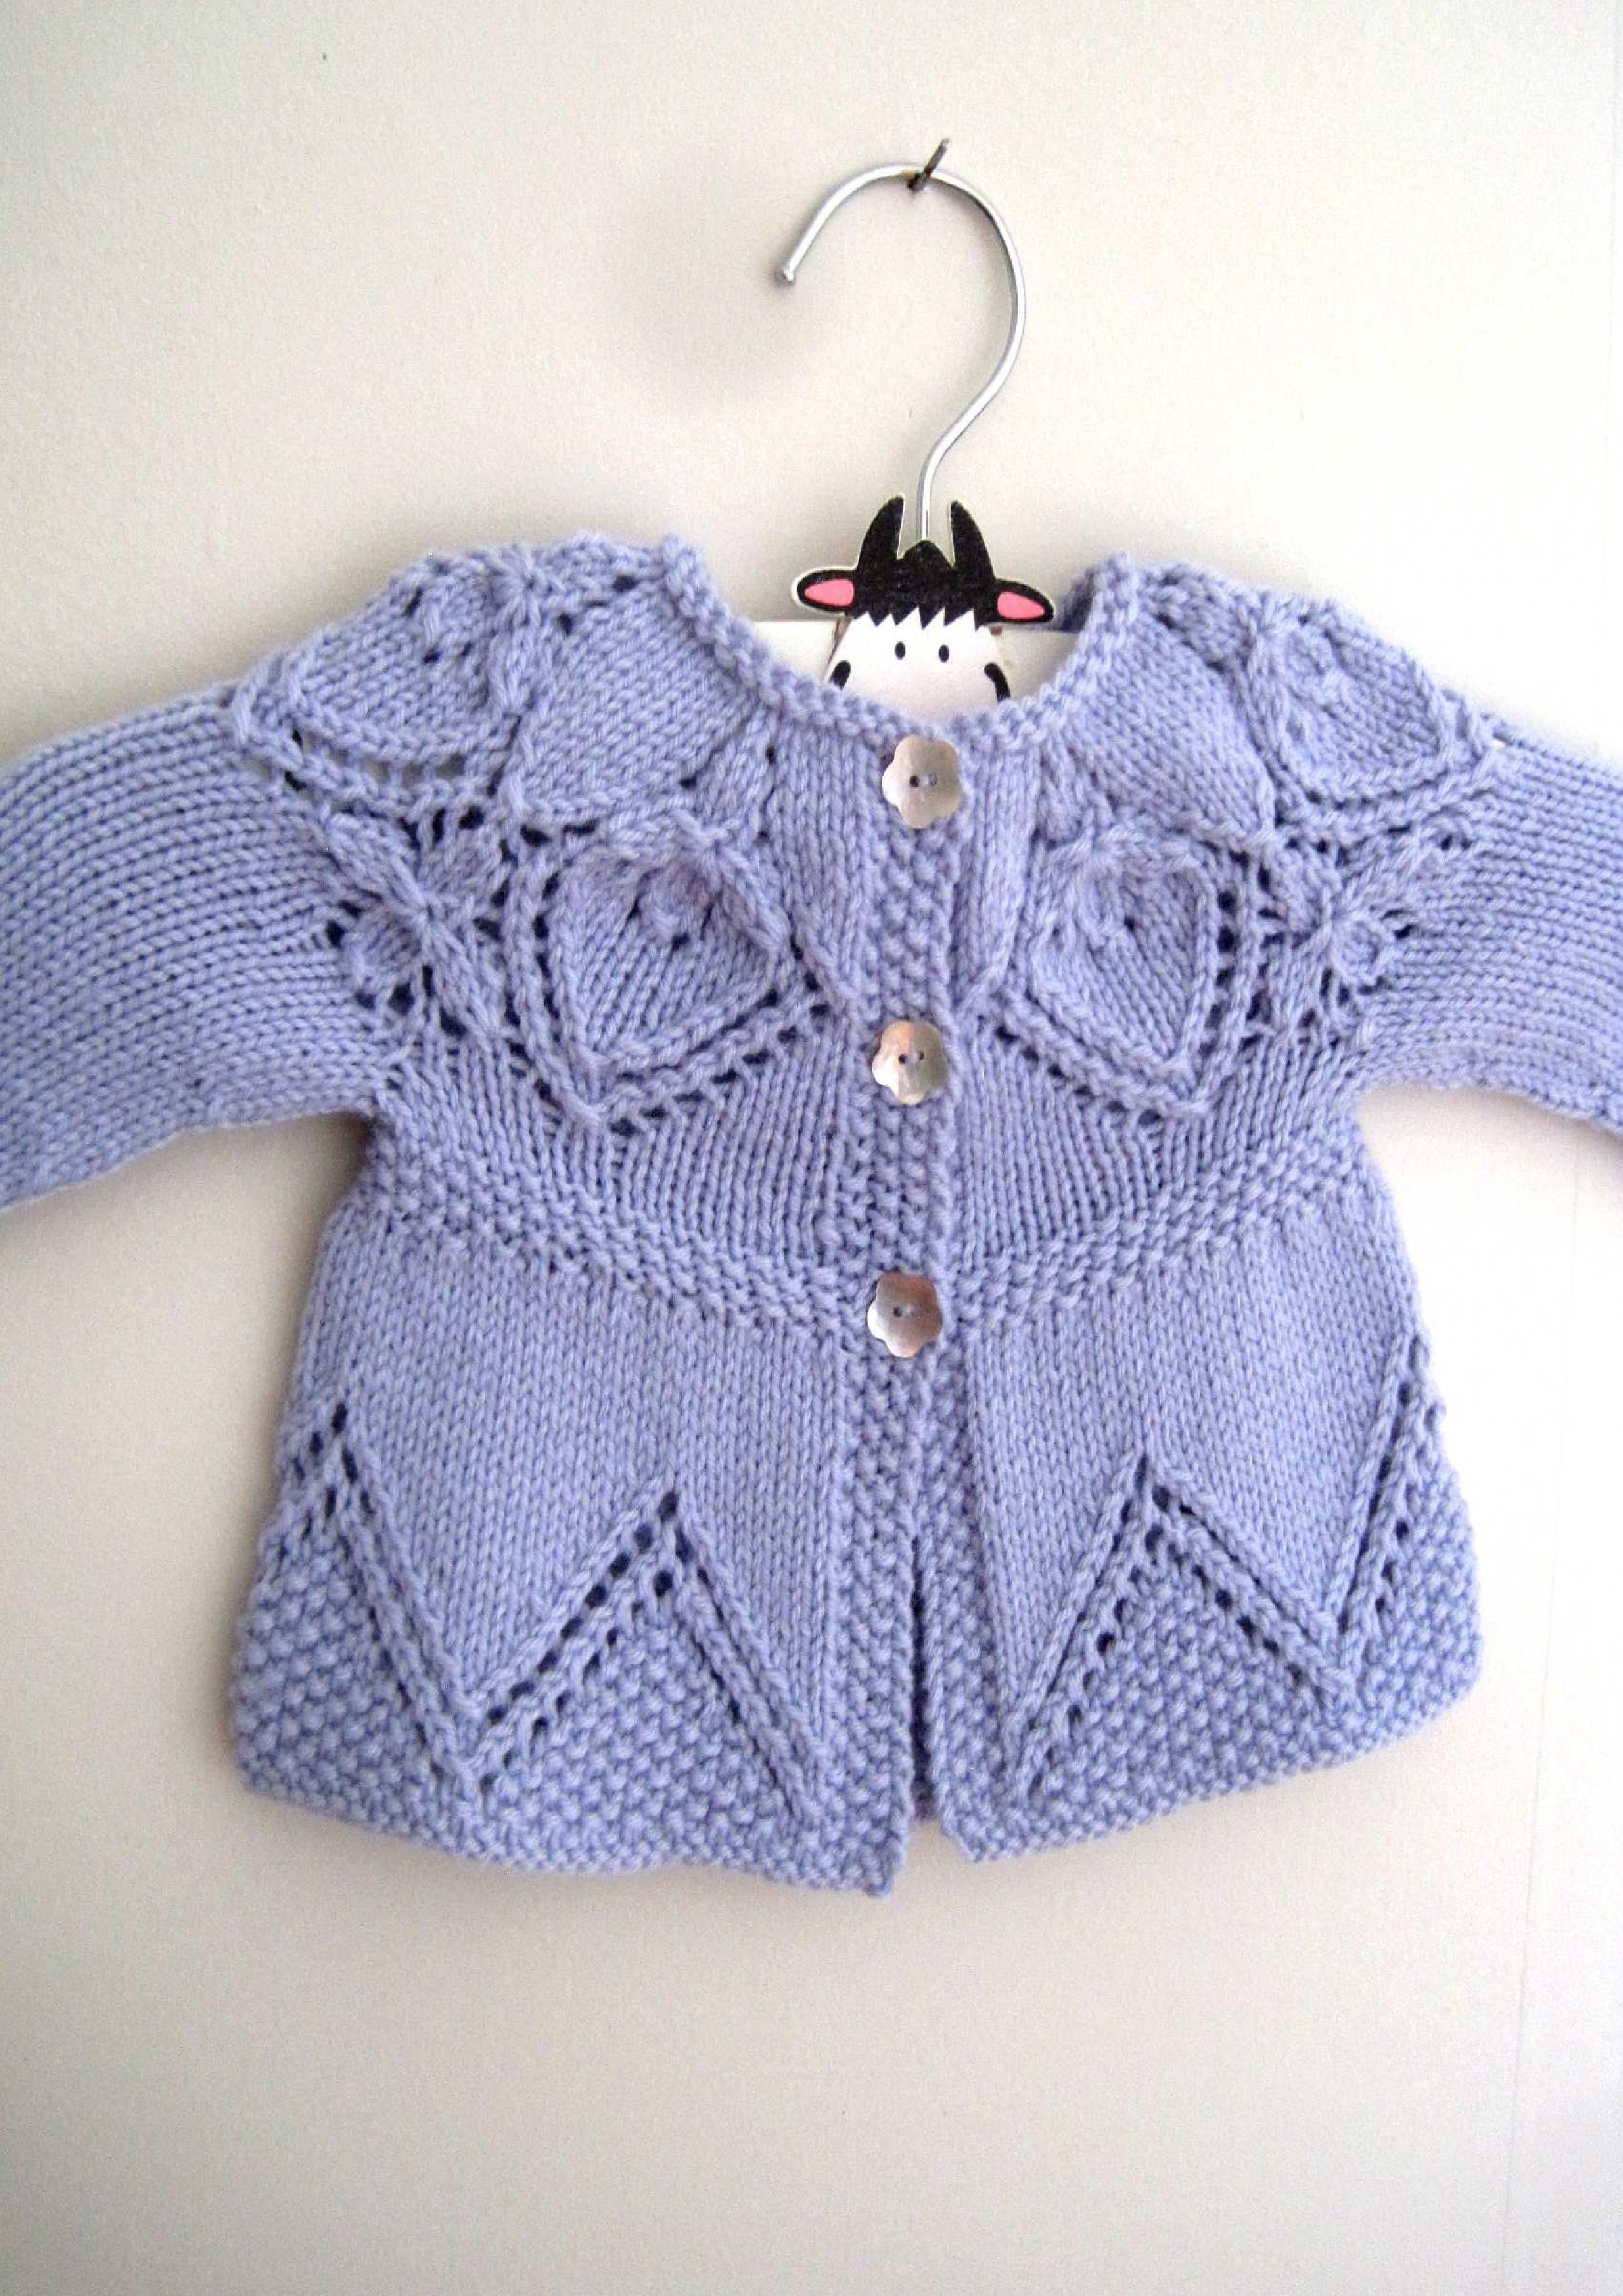 89aab2feb6ec Cora Cardi Knitting Pattern by Suzie Sparkles. Baby cardigan ...